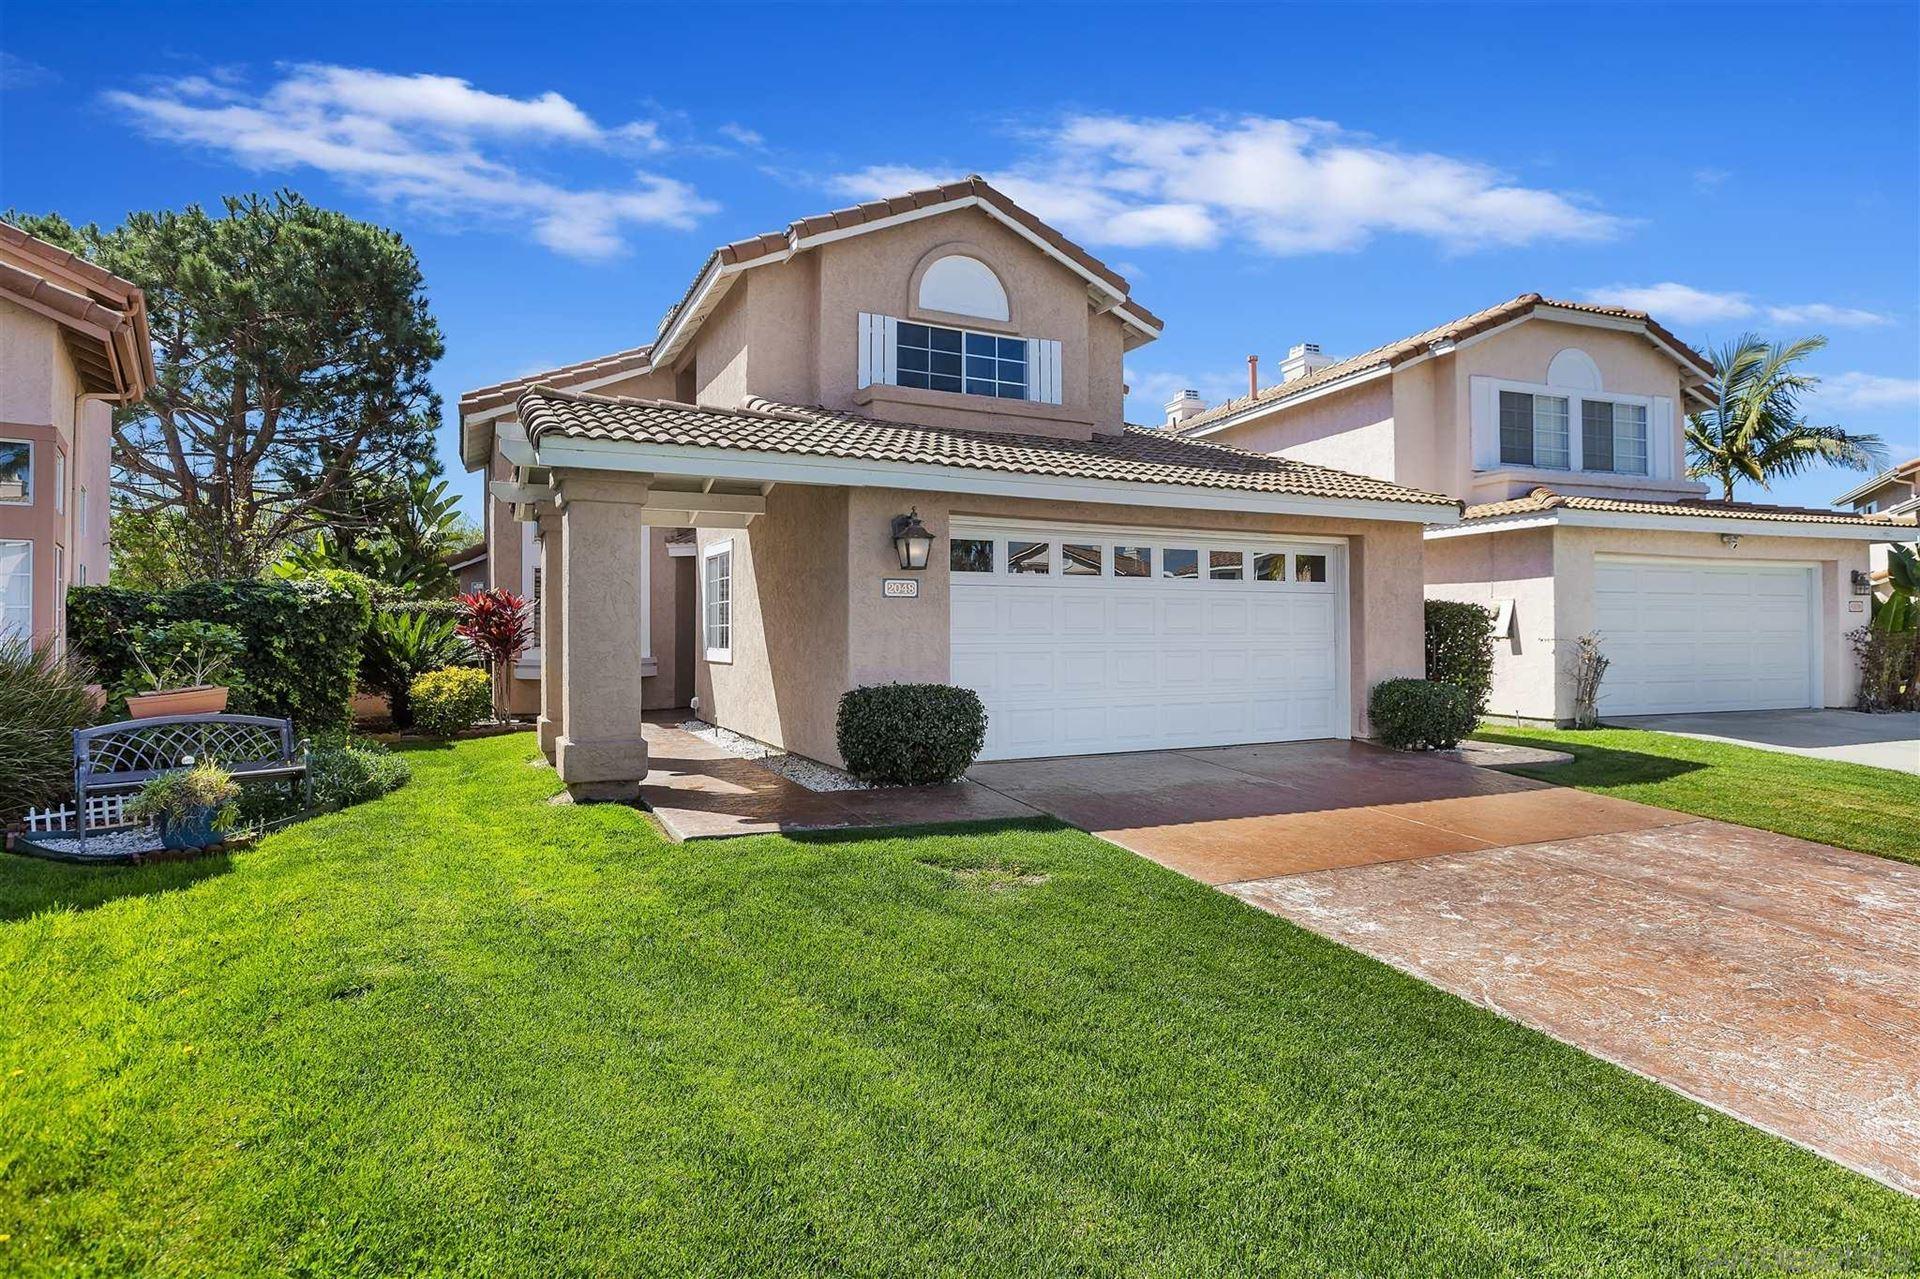 Photo of 2048 San Remo Dr, Oceanside, CA 92056 (MLS # 210005786)